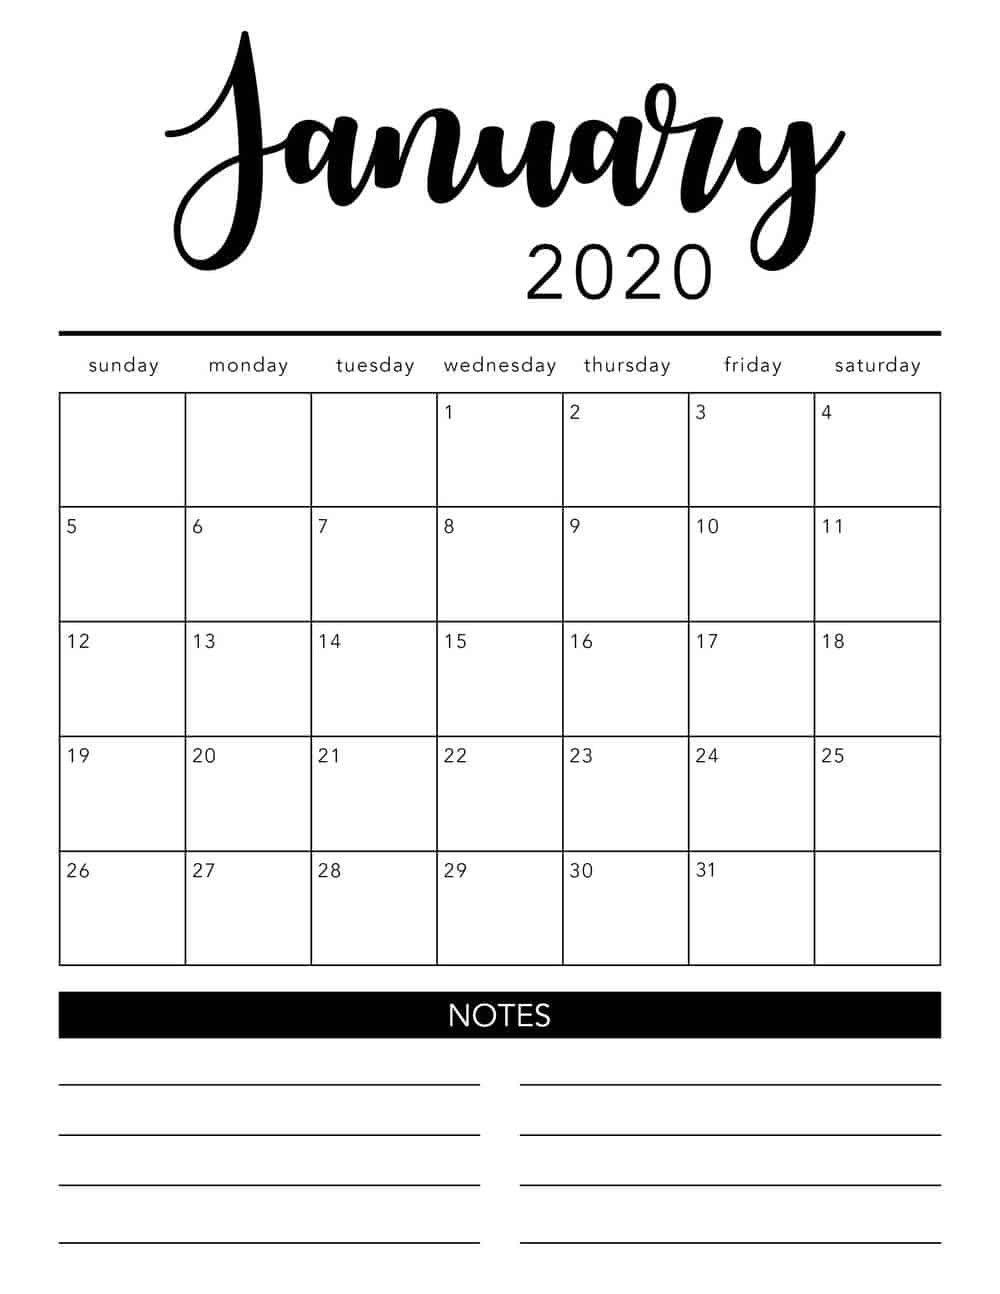 Free 2020 Printable Calendar Template 2 Colors I 2020 E Page in 2020 Calendar Printable Free Pdf Color